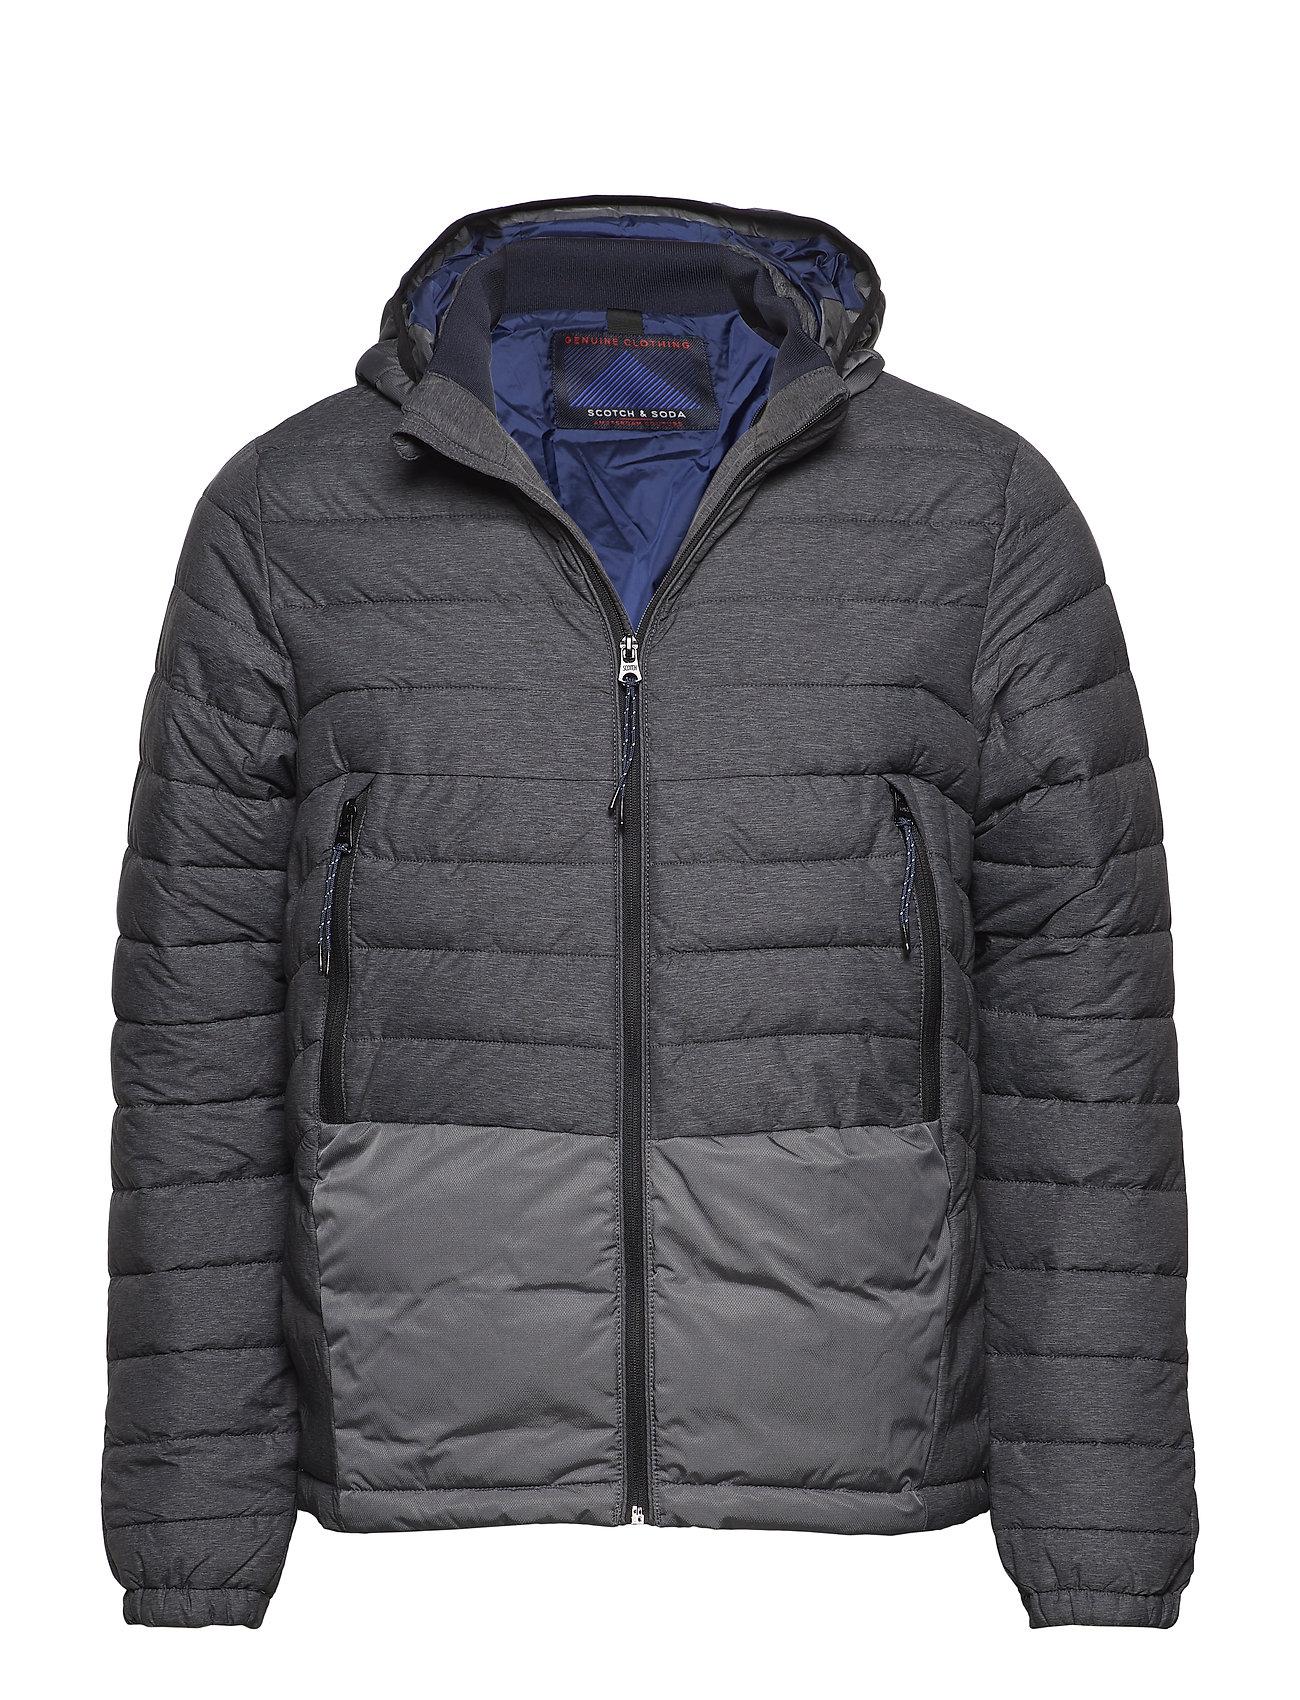 Scotch & Soda Short quilted nylon jacket with detachable hood - BLACK MELANGE